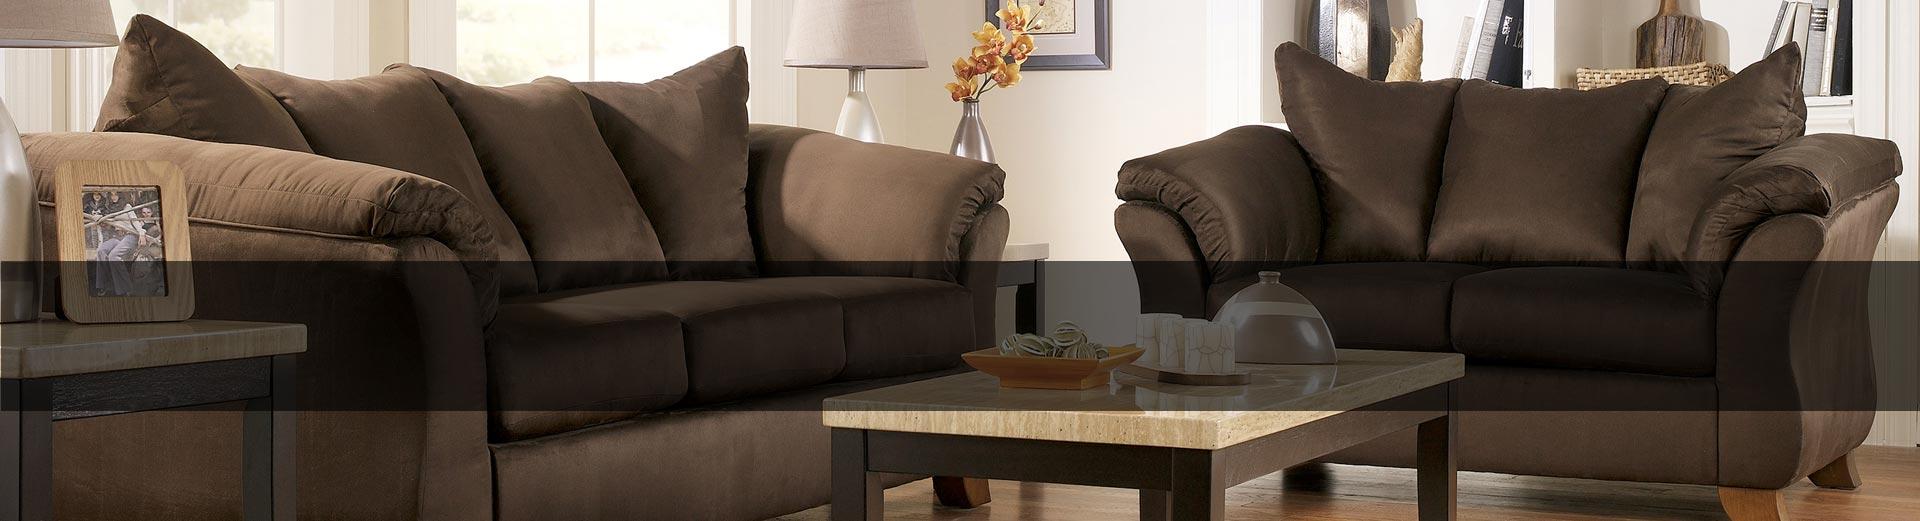 Ace Upholstery Supplies Ltd